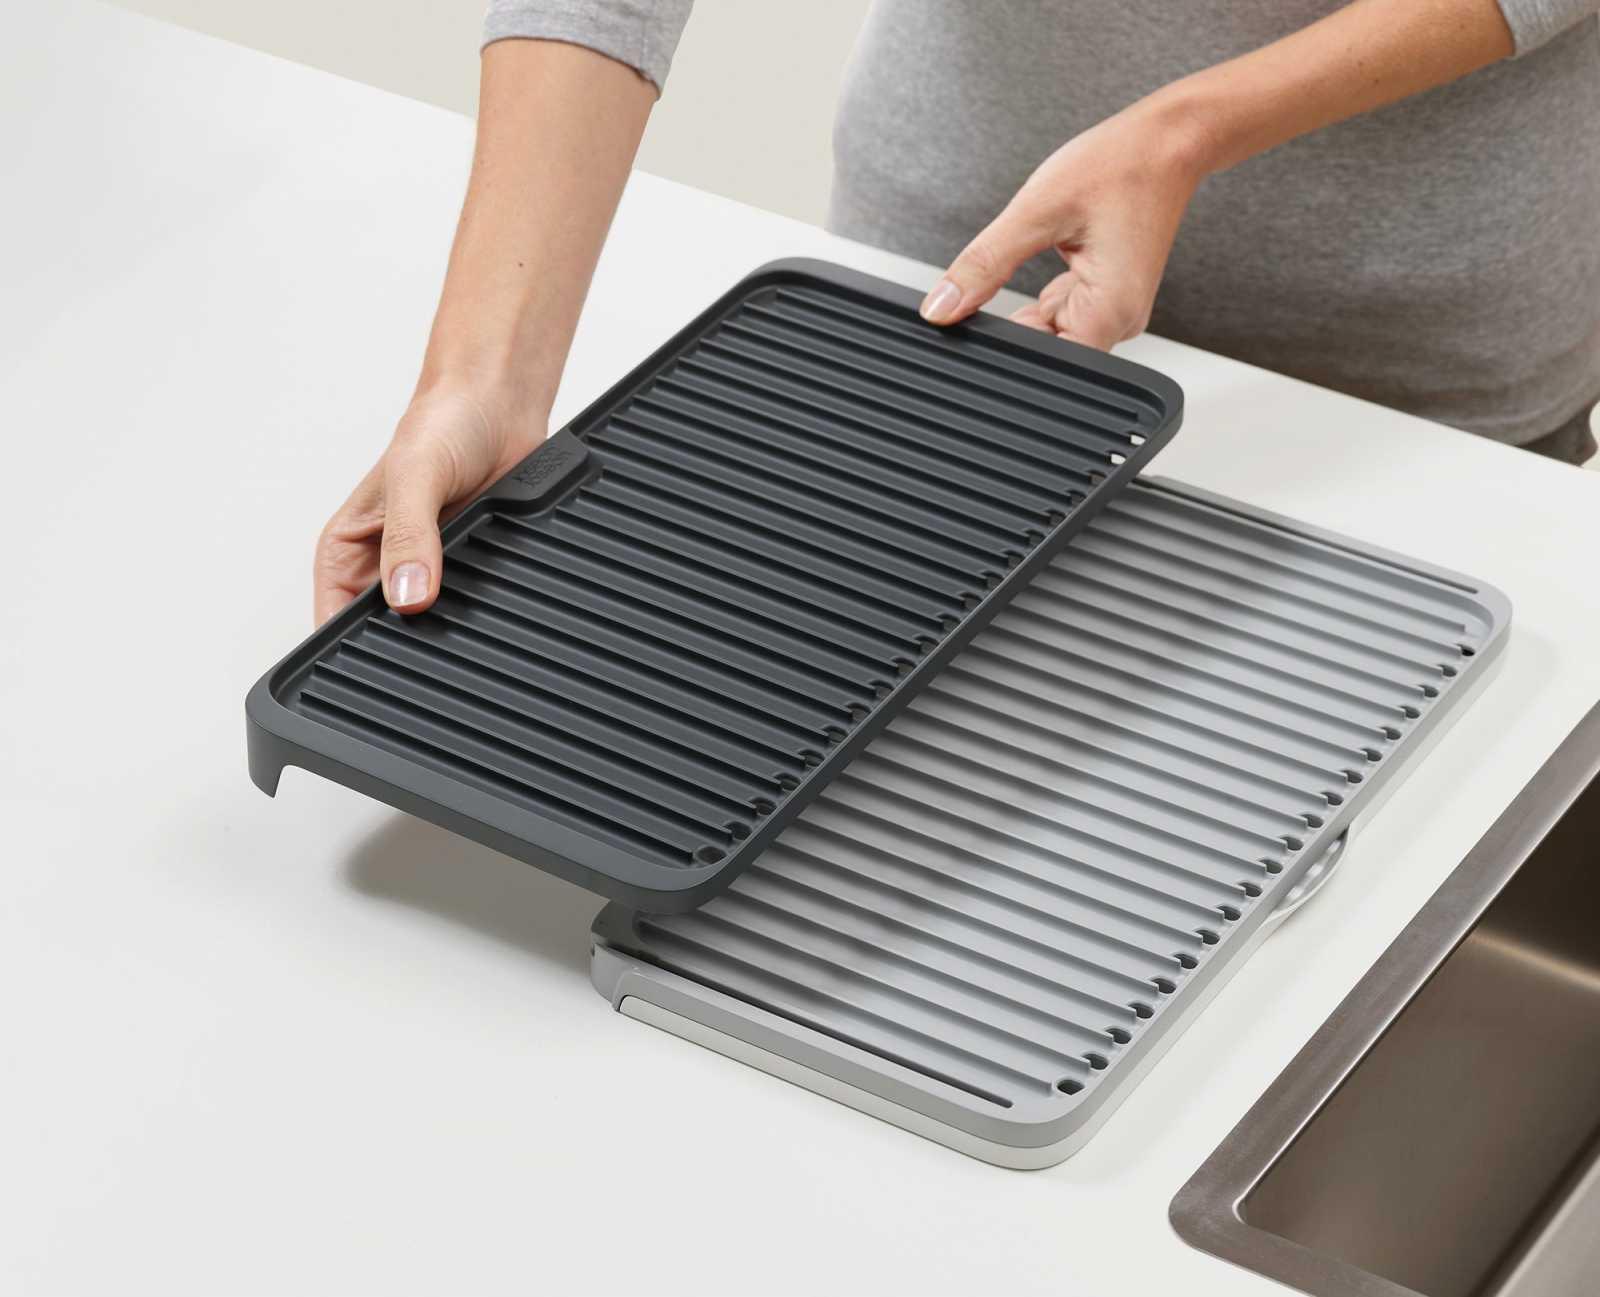 Коврик для сушки посуды раскладной Joseph Joseph Tier™, серый Joseph Joseph 85178 фото 4